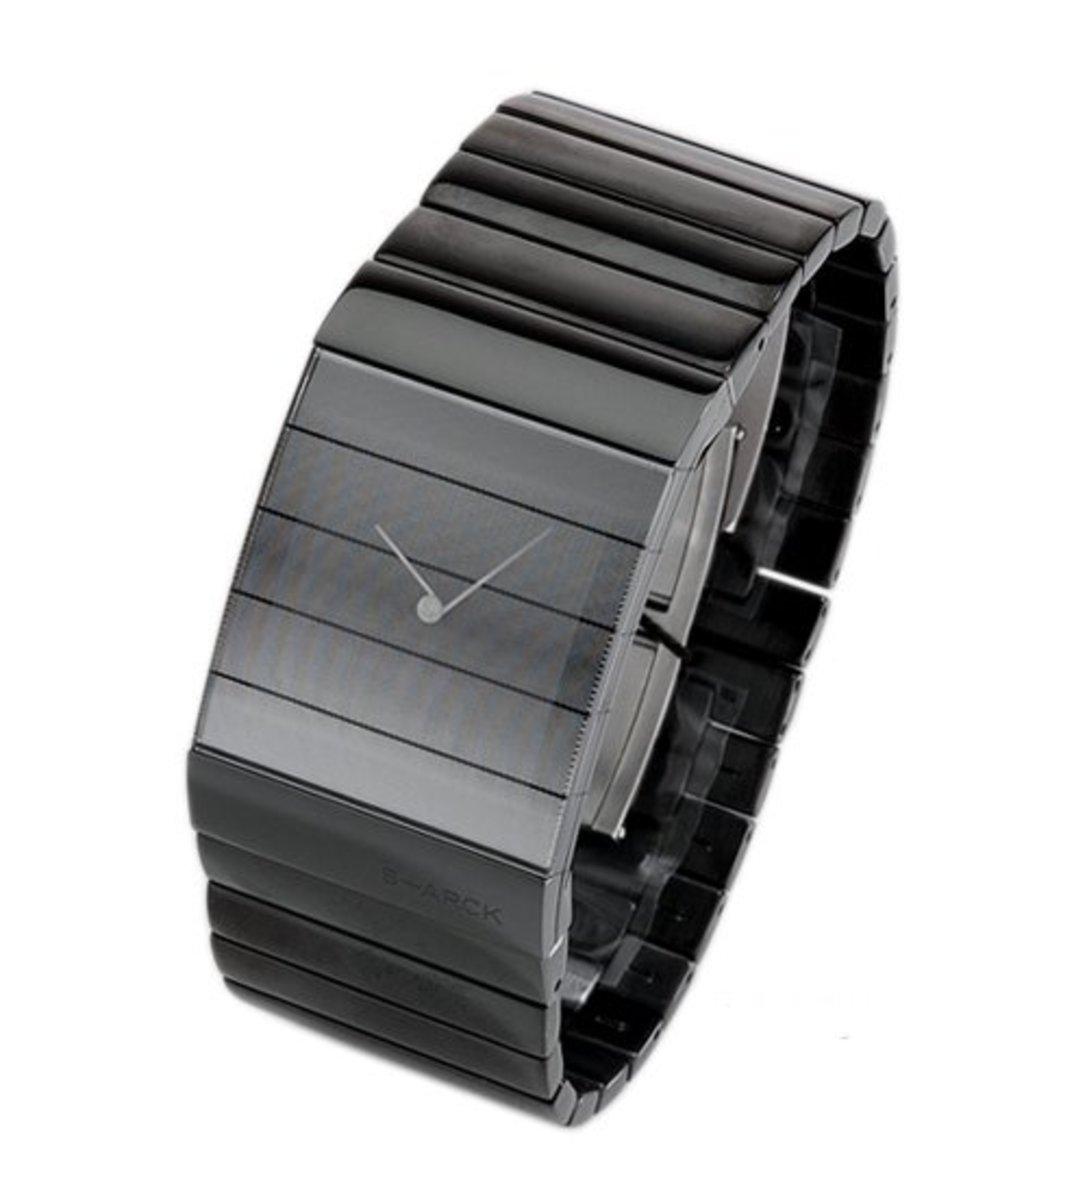 Philippe S+arck Veiled Watch